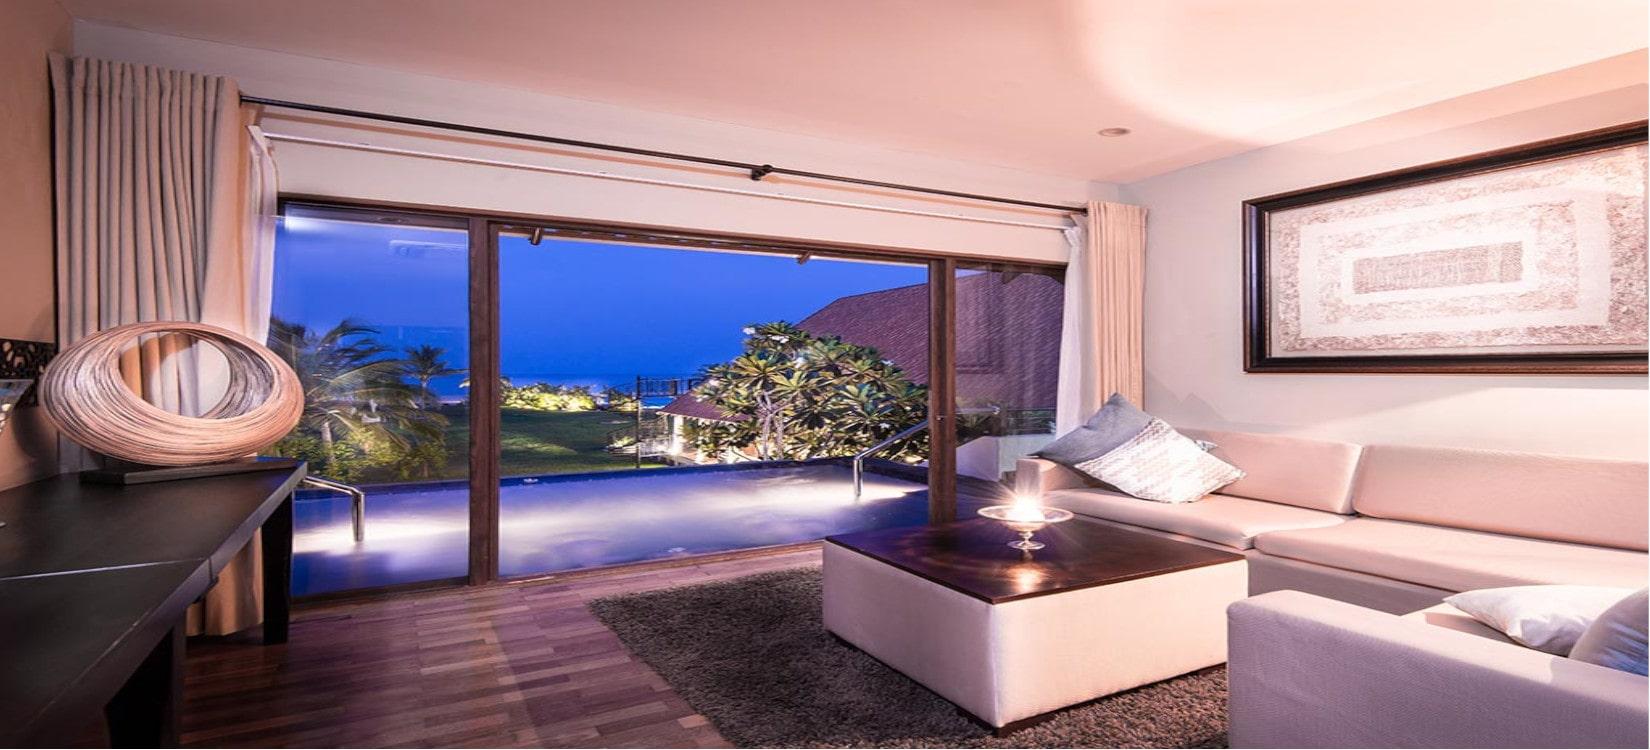 bay suite uga hotel-min